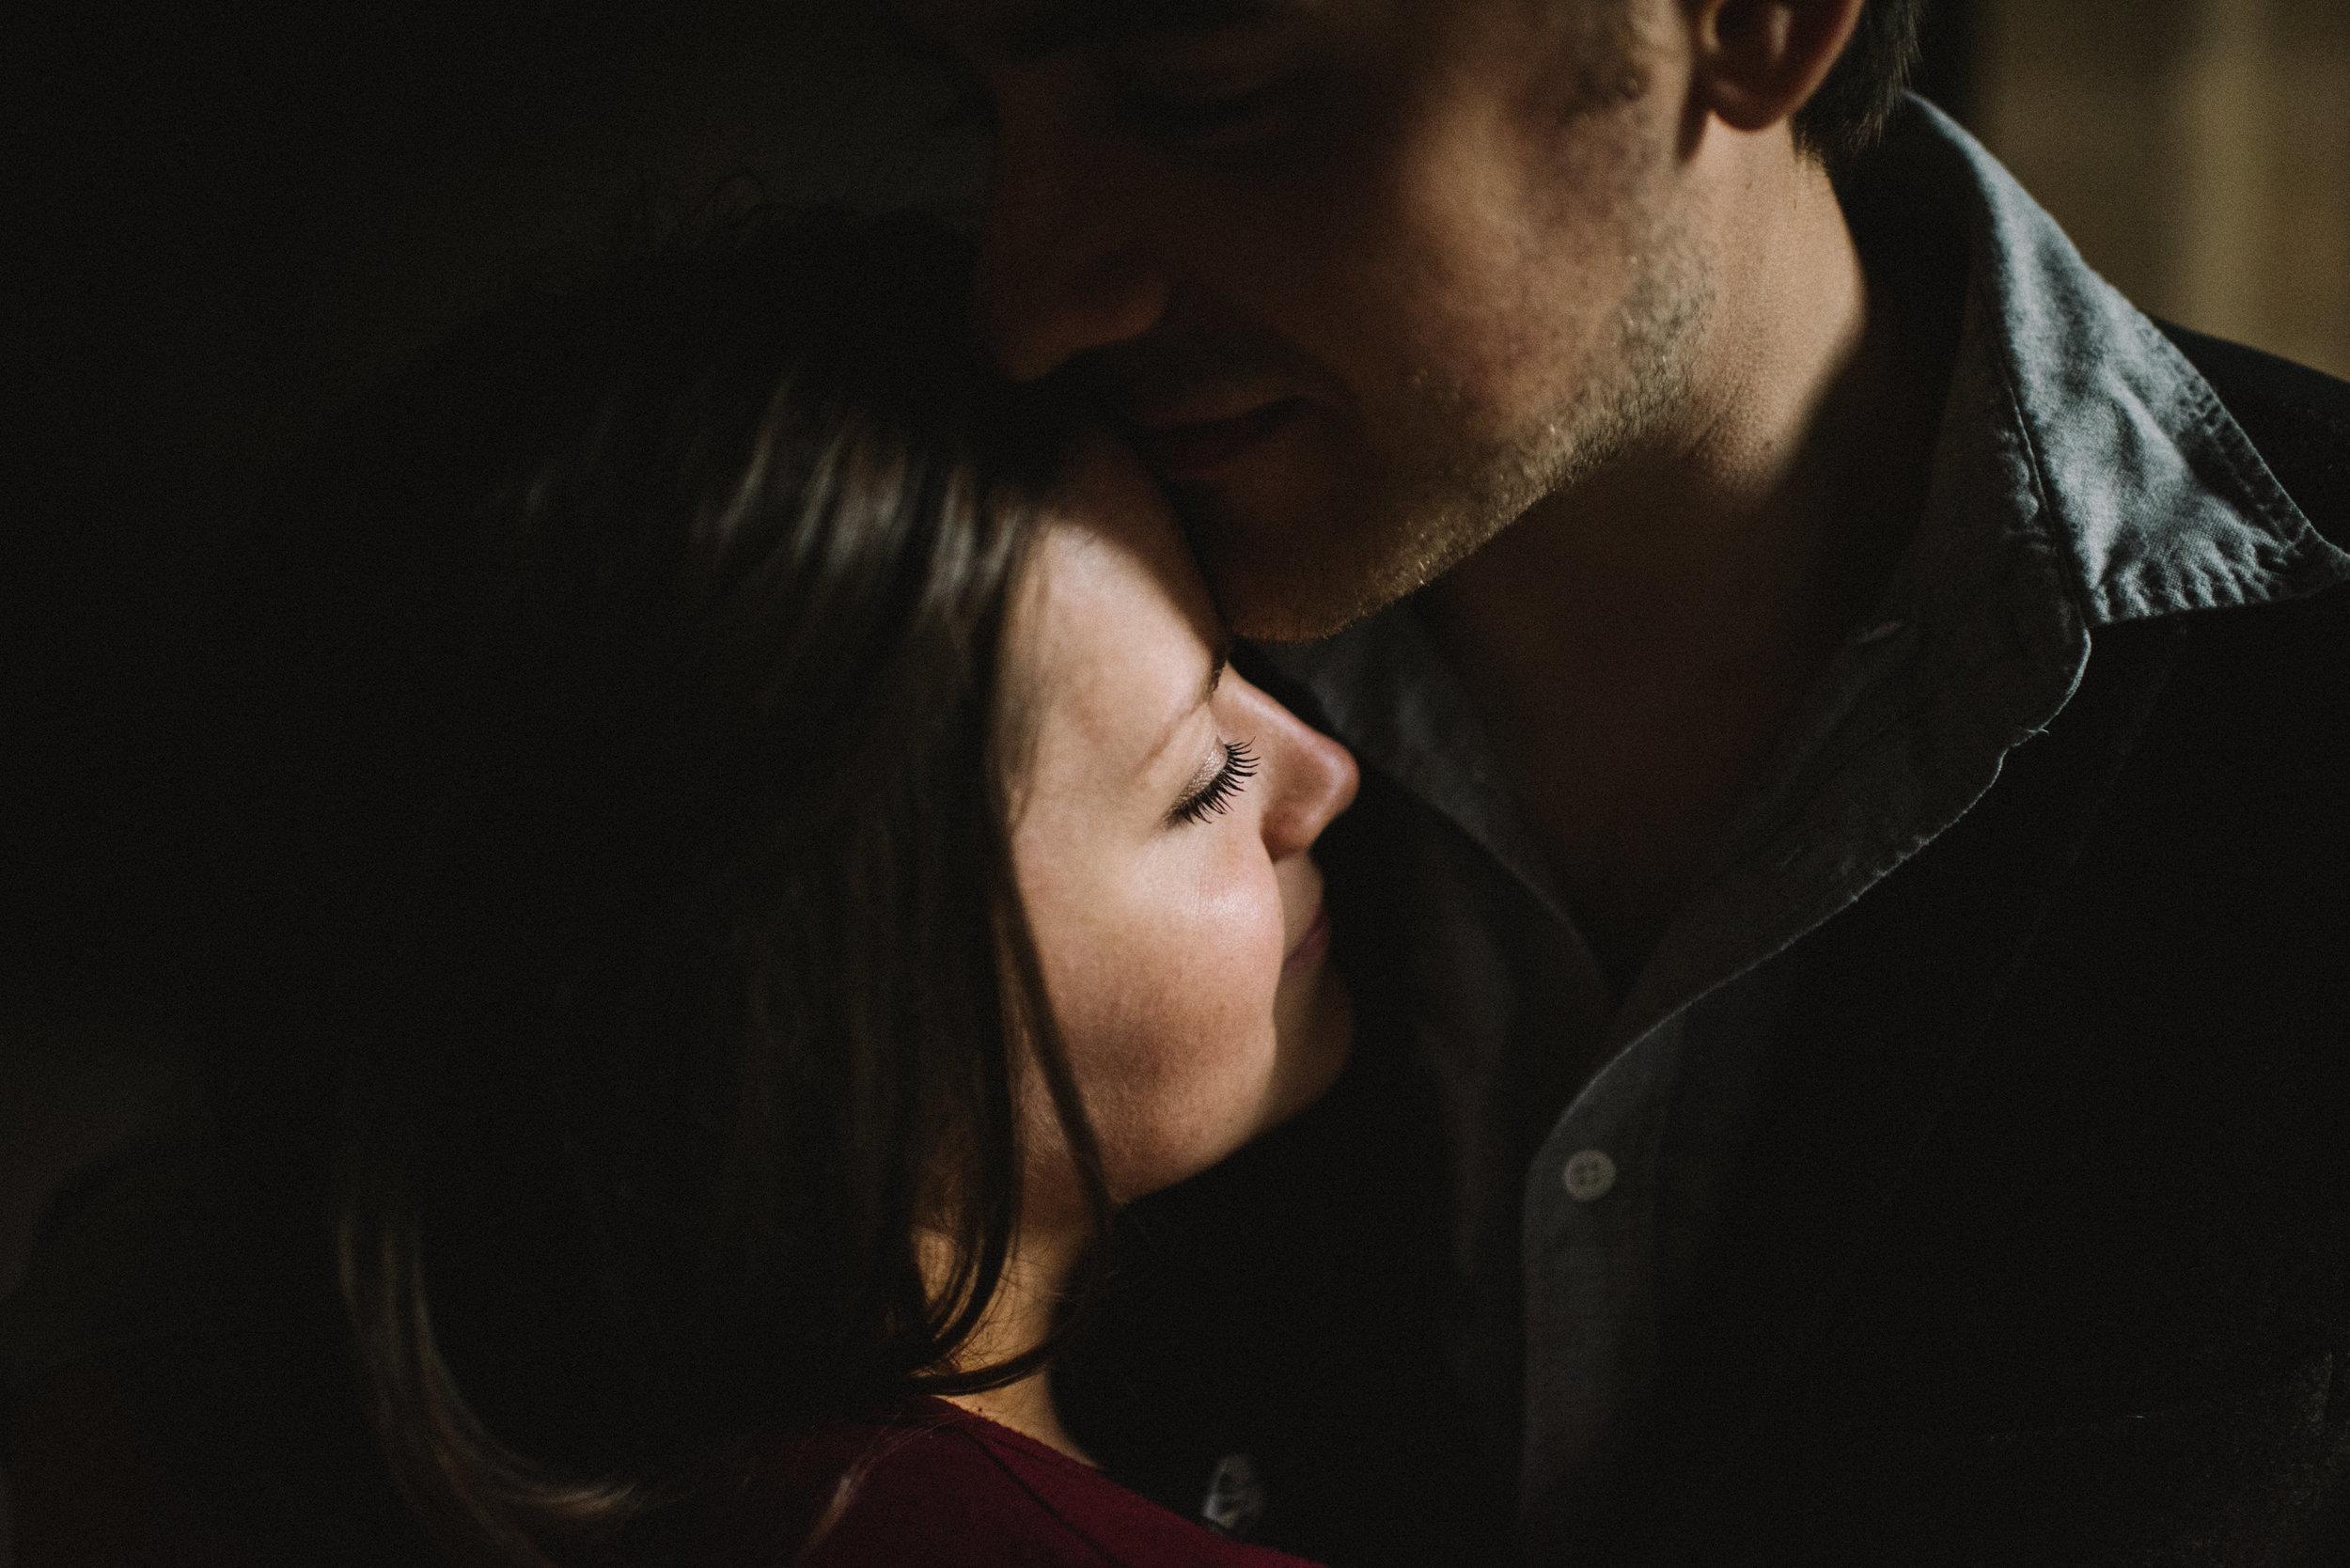 0066-LISA-DEVINE-PHOTOGRAPHY-ALTERNATIVE-WEDDING-PHOTOGRAPHY-SCOTLAND-DESTINATION-WEDDINGS-GLASGOW-WEDDINGS-COOL-WEDDINGS-STYLISH-WEDDINGS.JPG